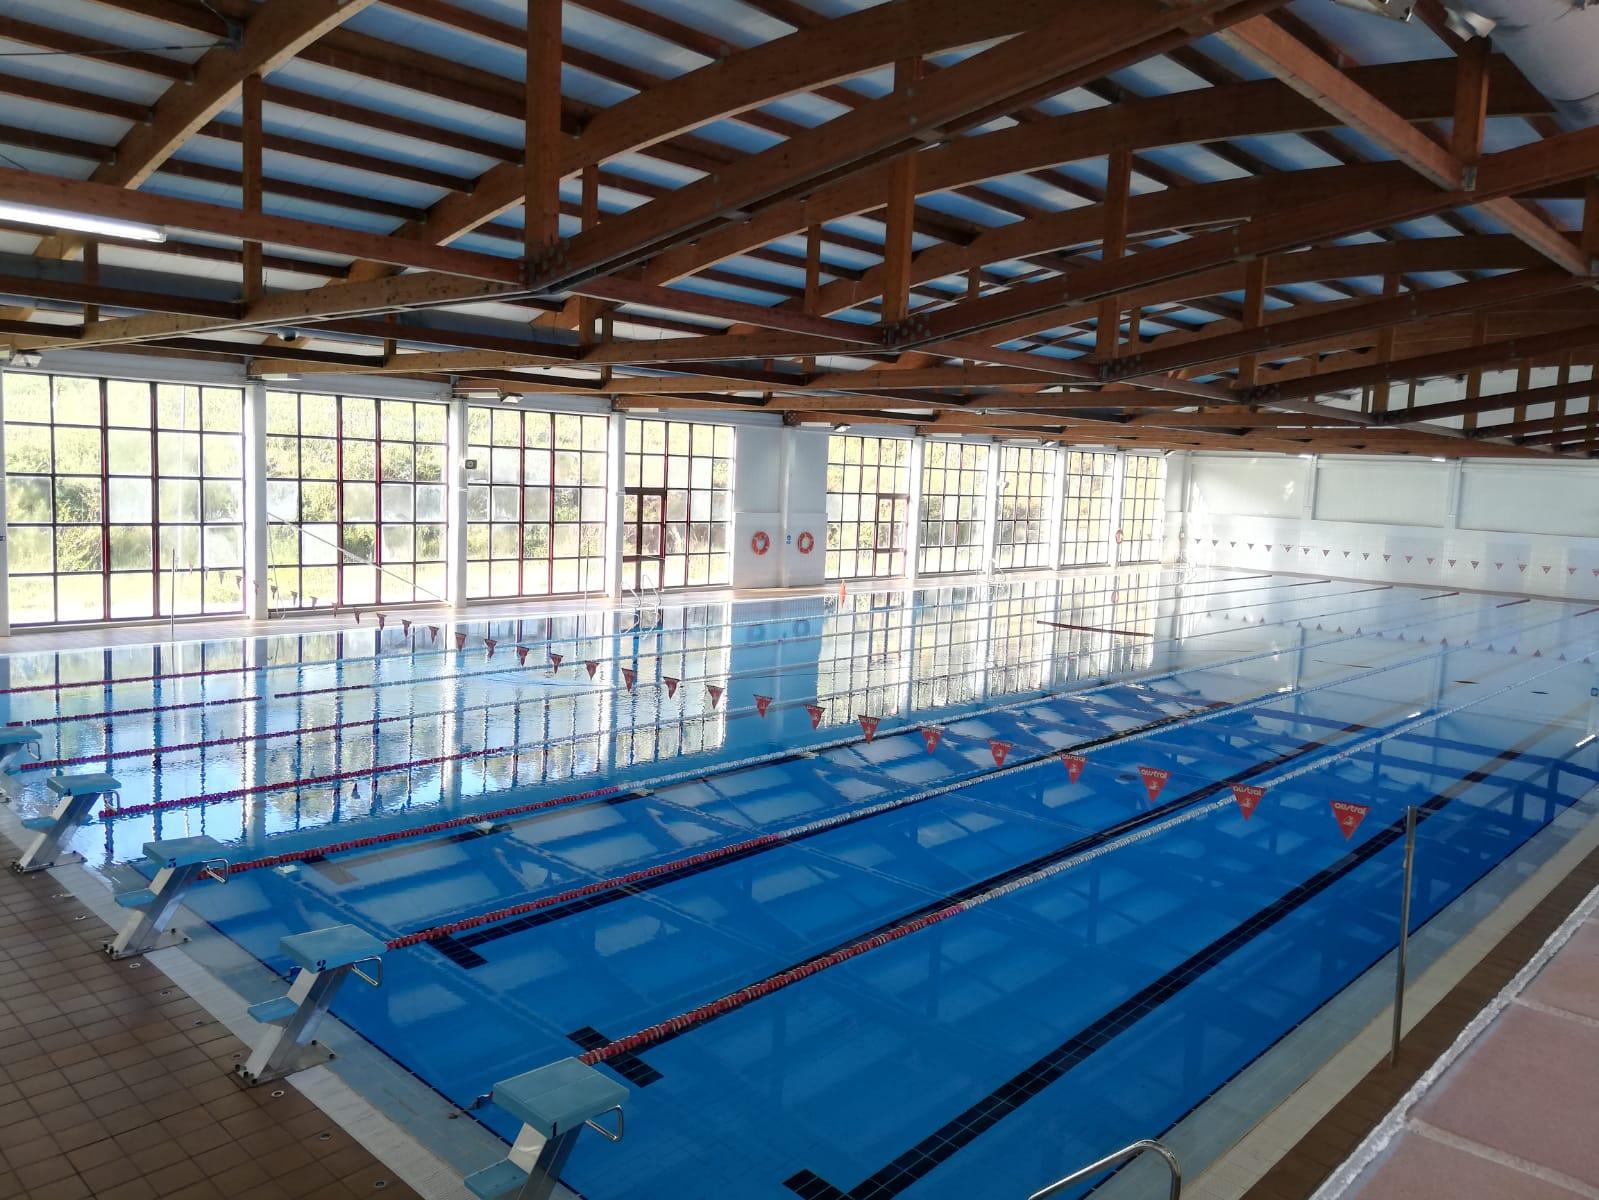 Entrada libre e sen cita previa de novo na piscina olímpica de Cervo